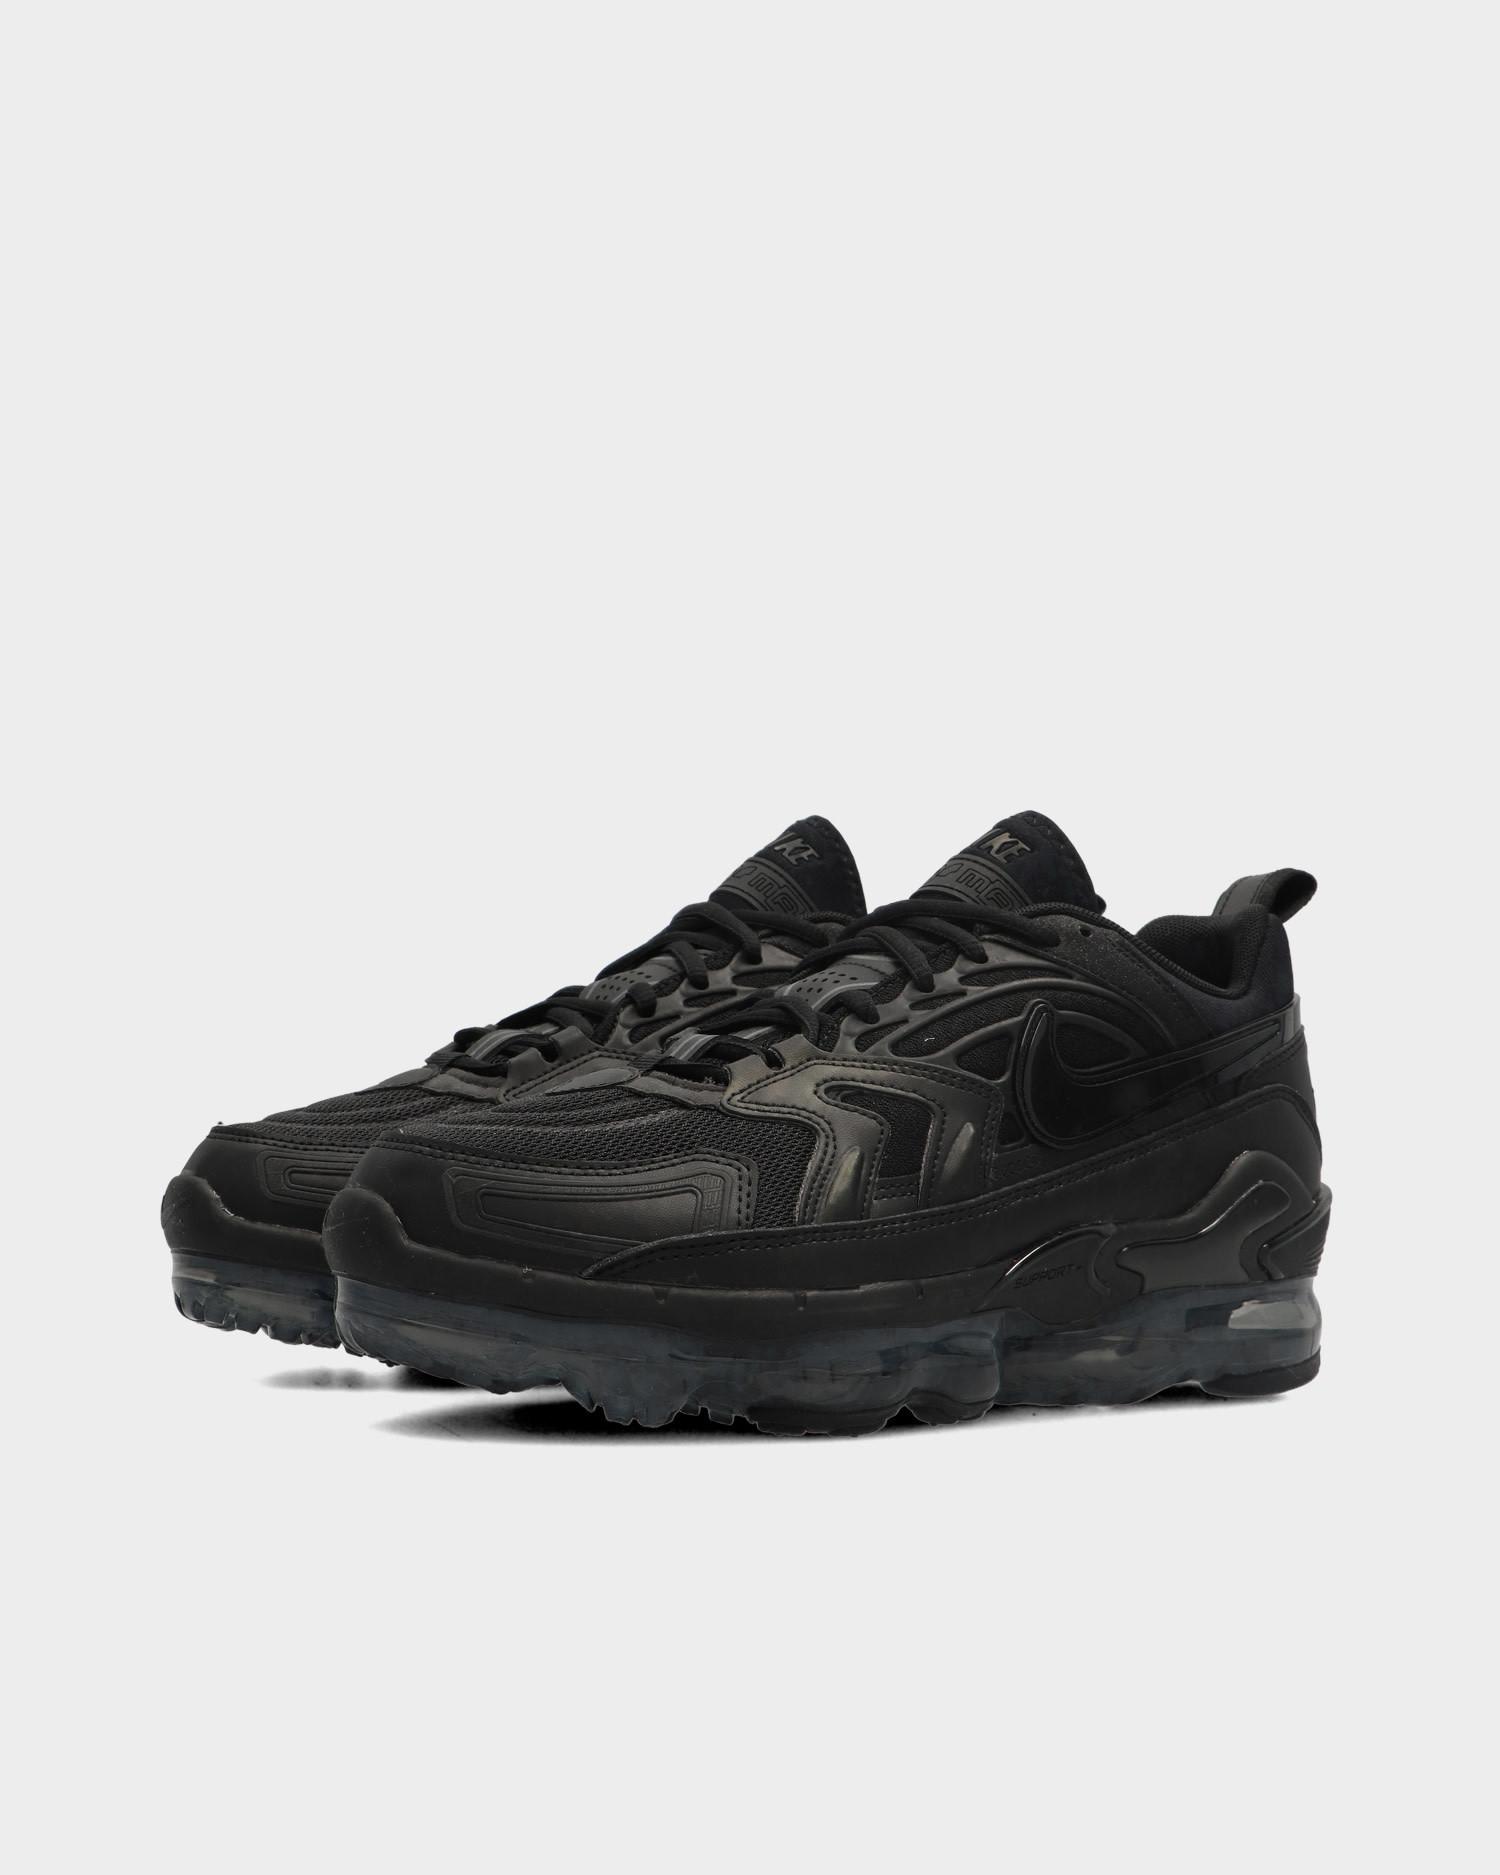 Nike Air Vapormax Evo Black/Black